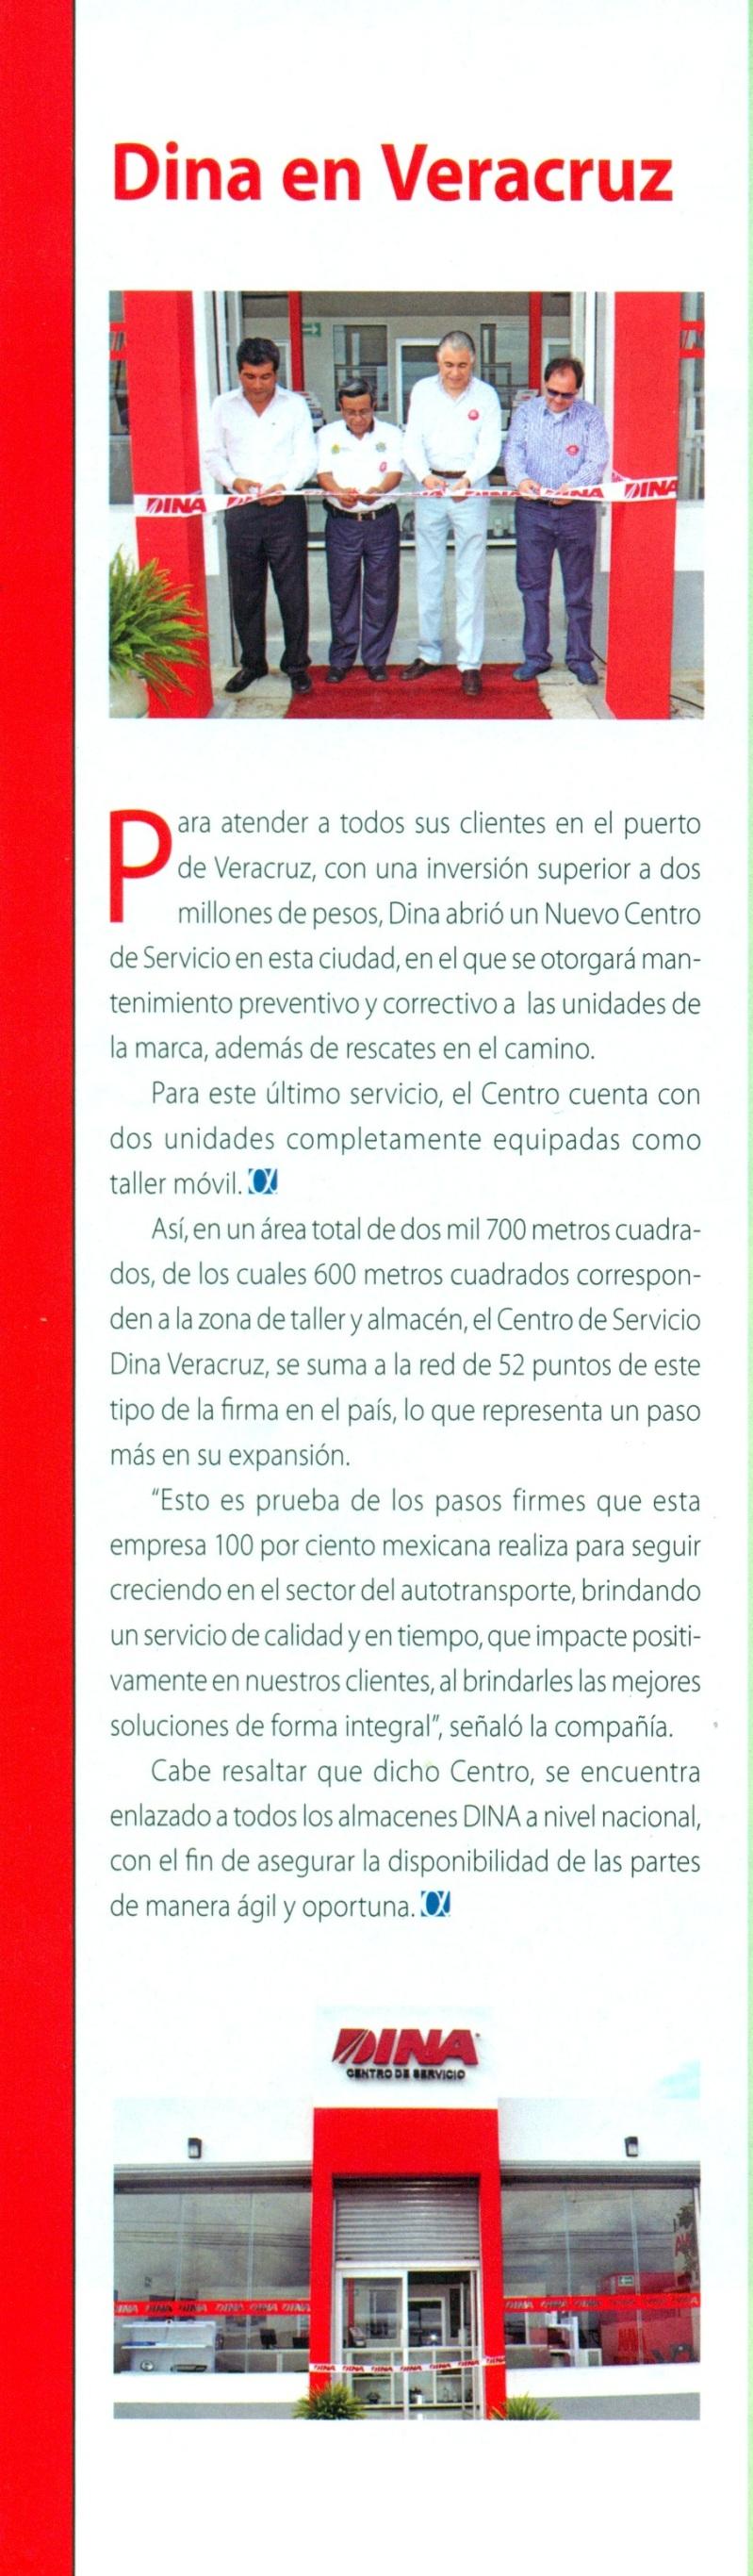 Revista %22Alianza Flotillera%22 Octubre 2013 Pag. 14